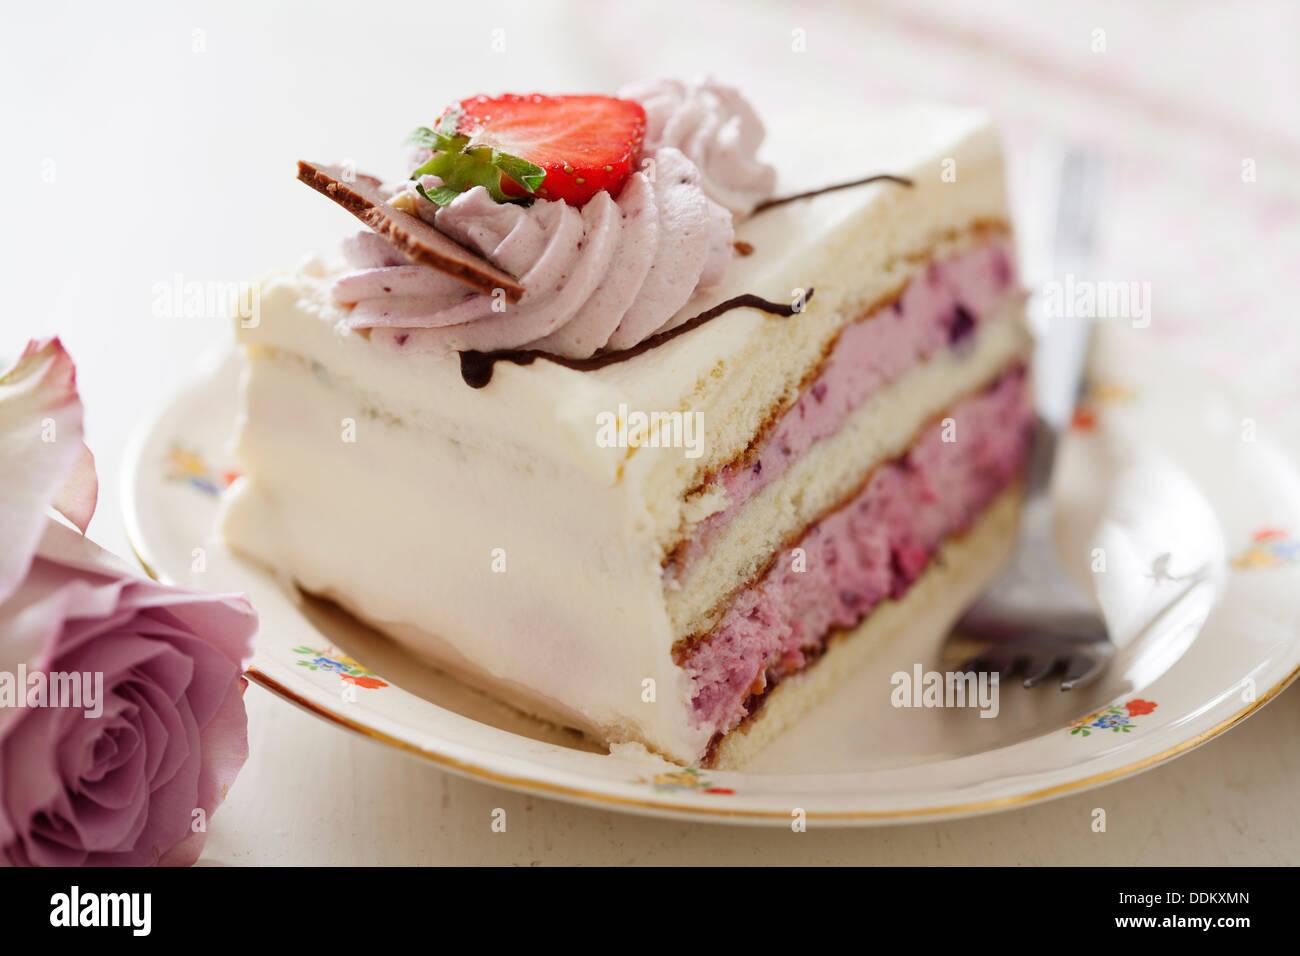 slice of layered cake - Stock Image